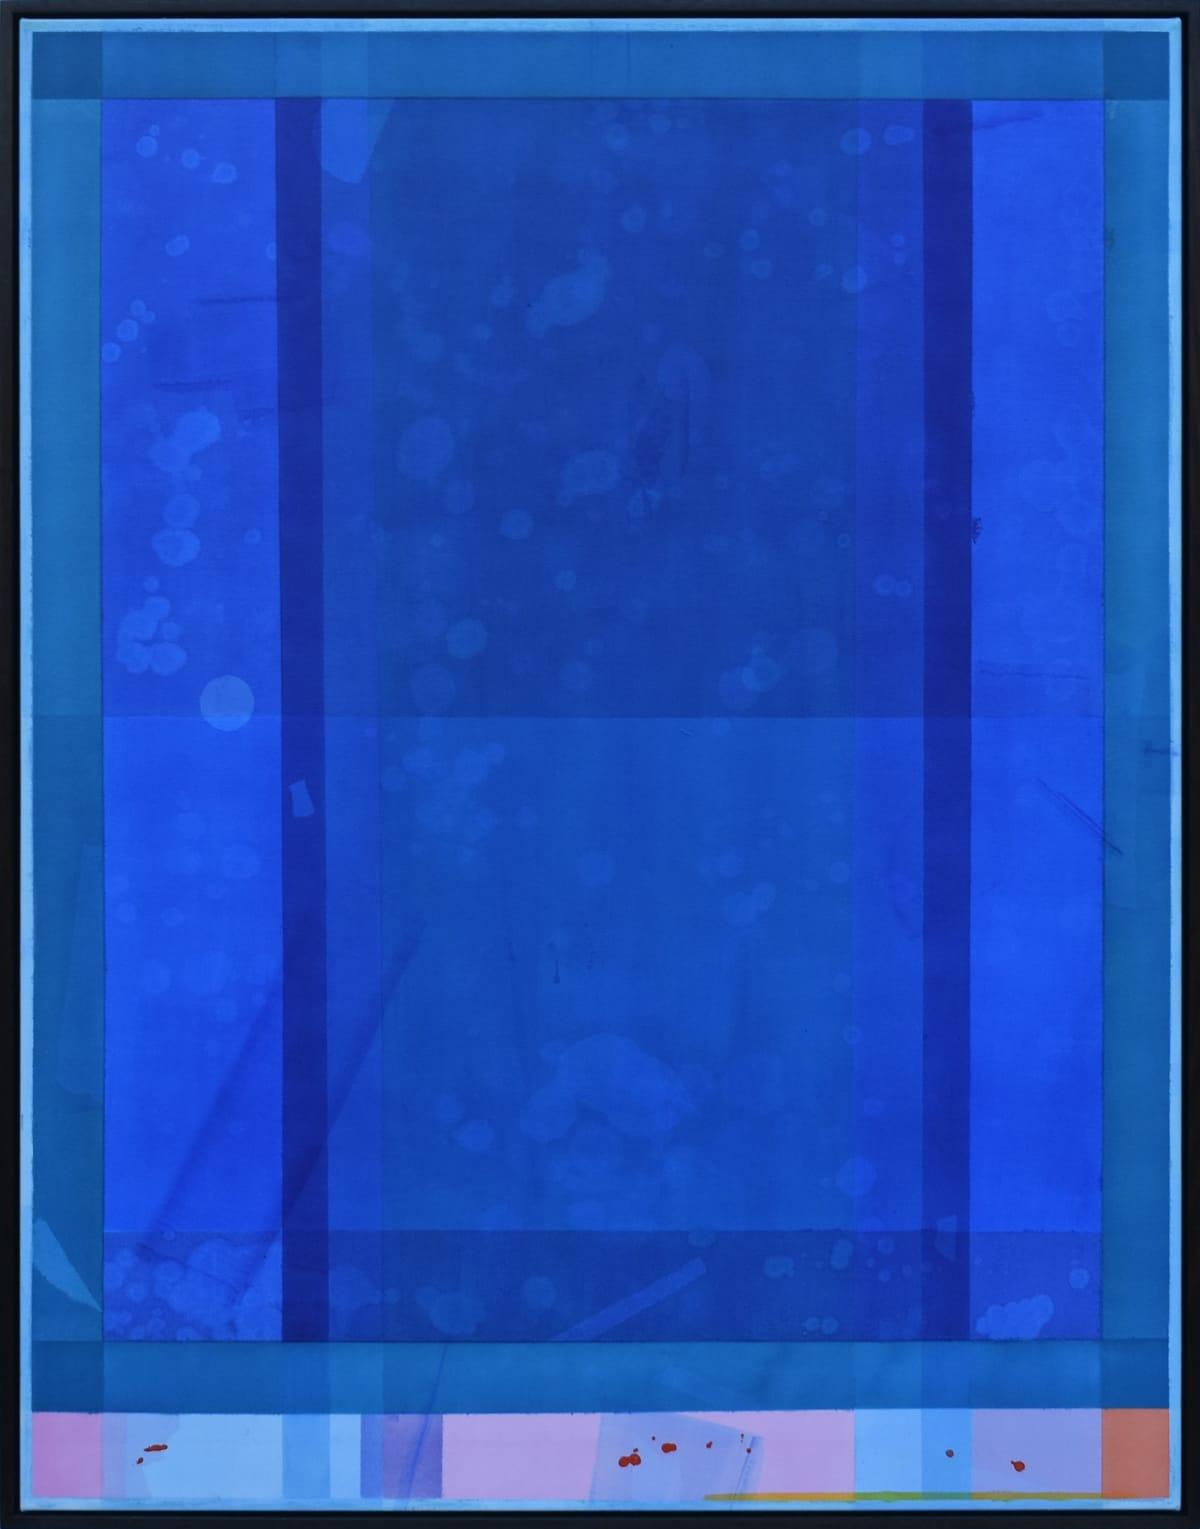 DANIELS, MAXIMILIAN, Clear, Blue, 2019